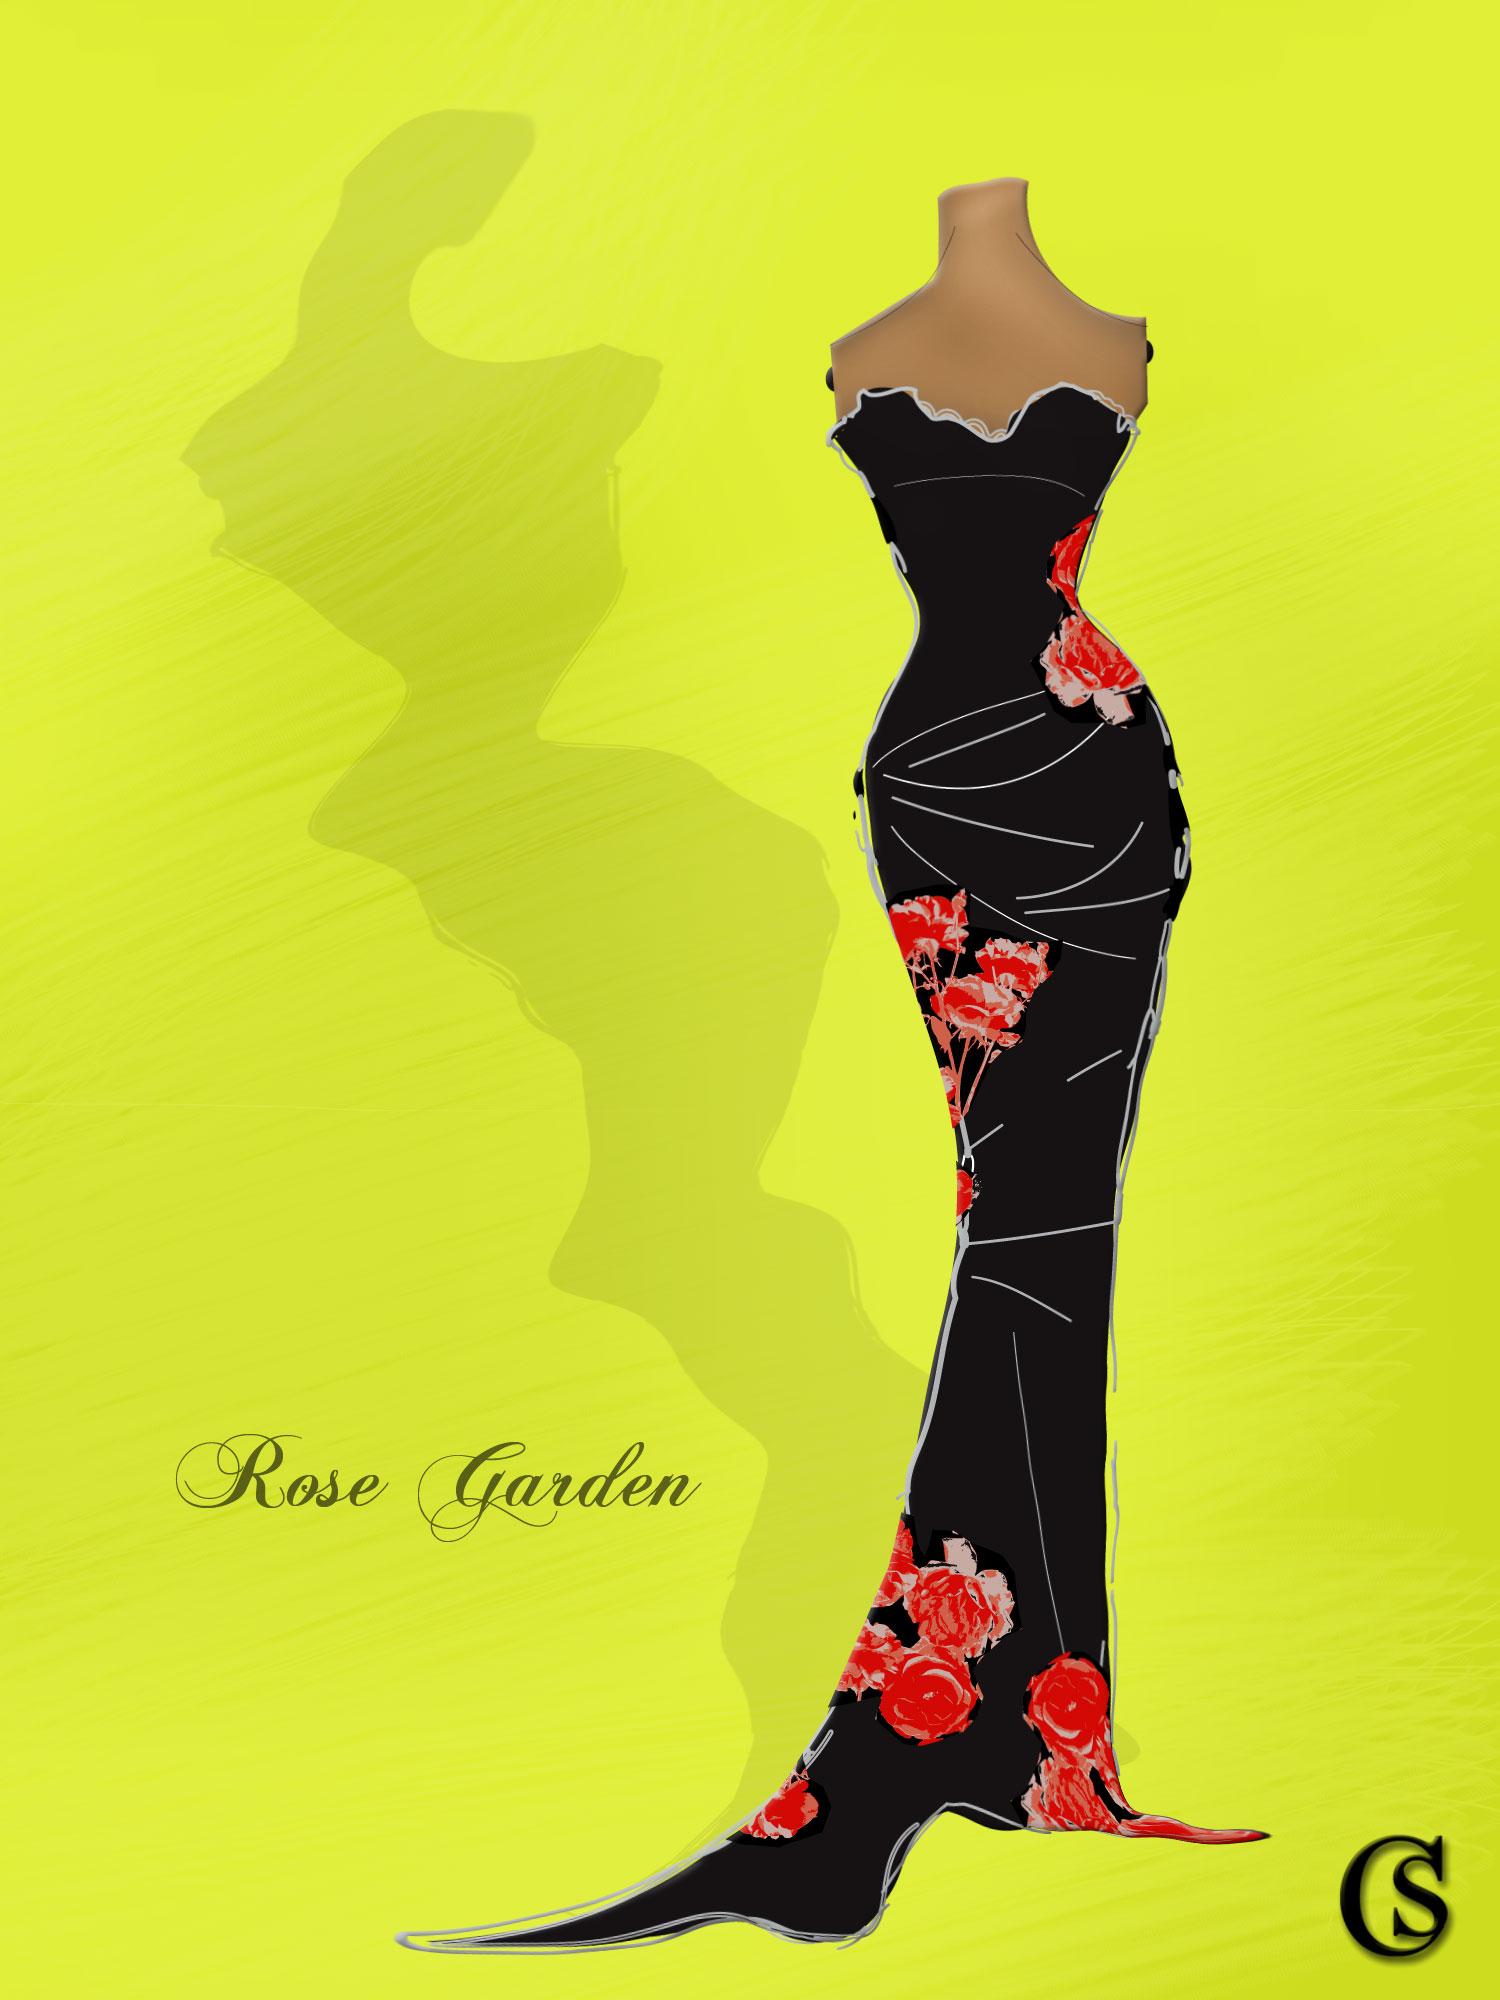 Slip into the Rose Garden, CHIARIstyle